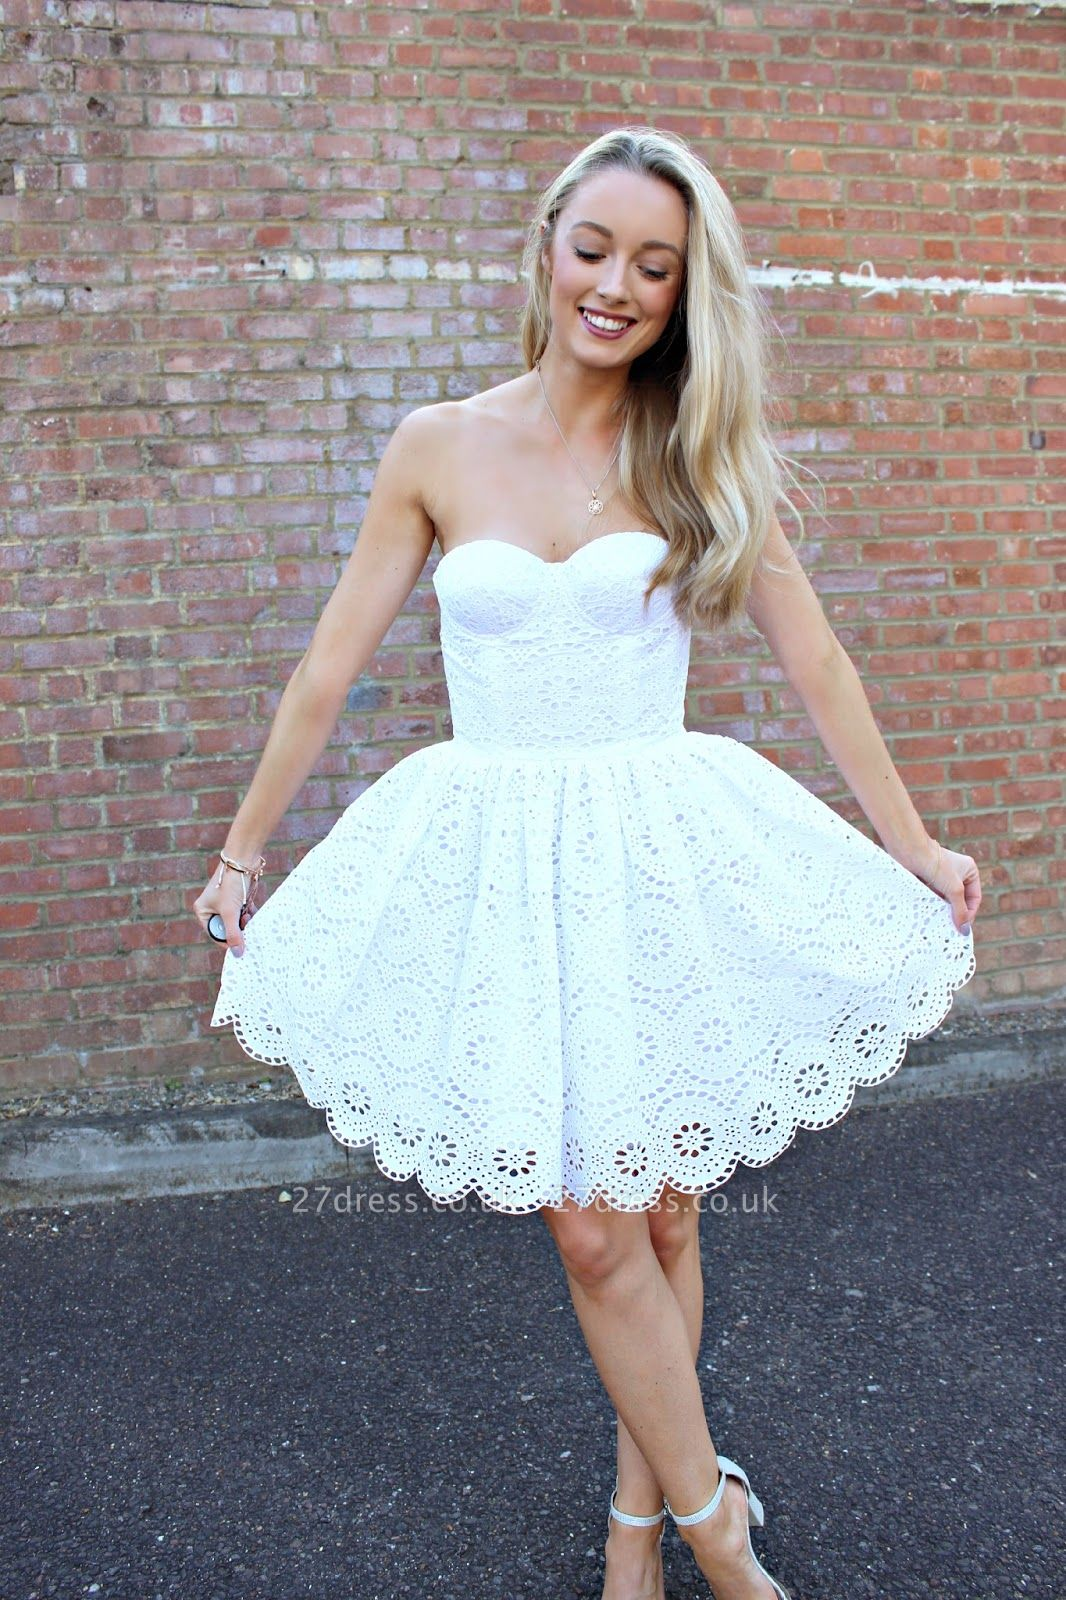 Sexy White Lace Short Homecoming Dress UK On Sale